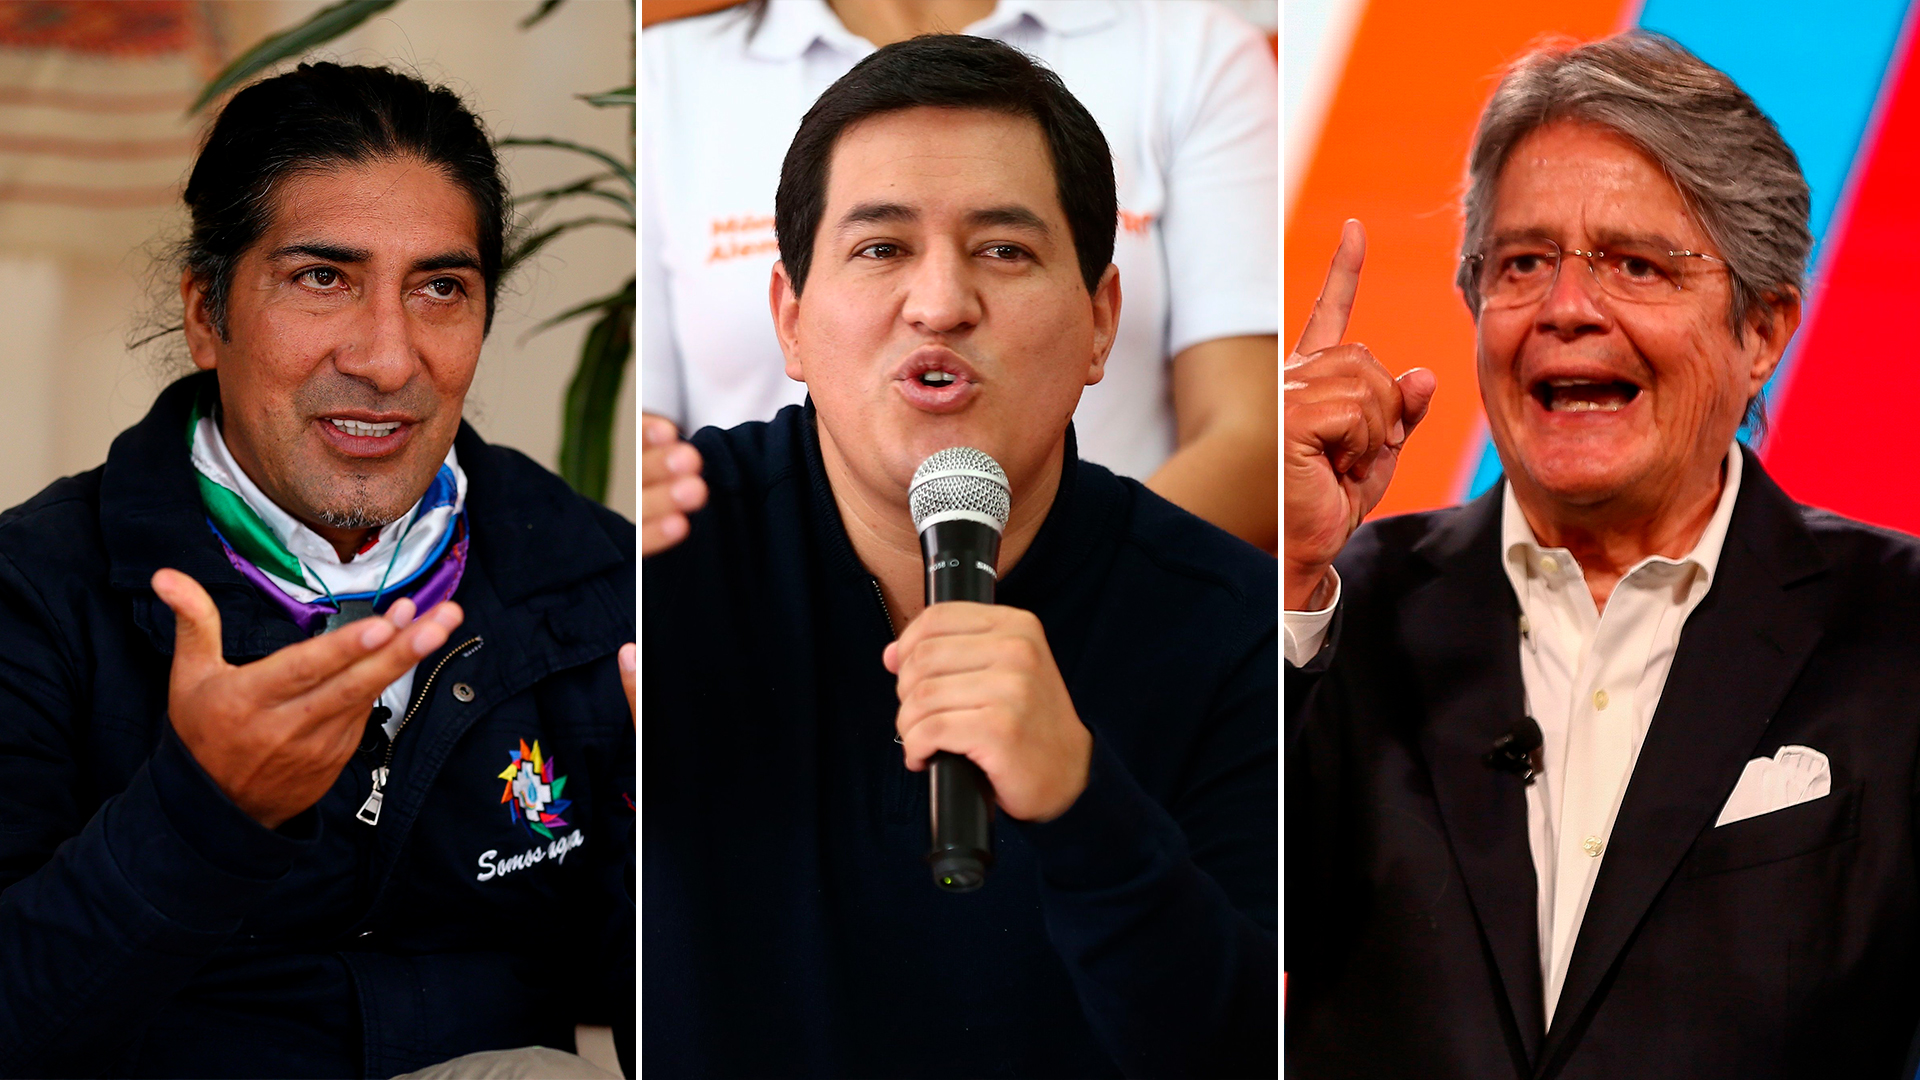 Elecciones en Ecuador: Andrés Arauz irá al ballottage con Yaku Pérez o Guillermo Lasso